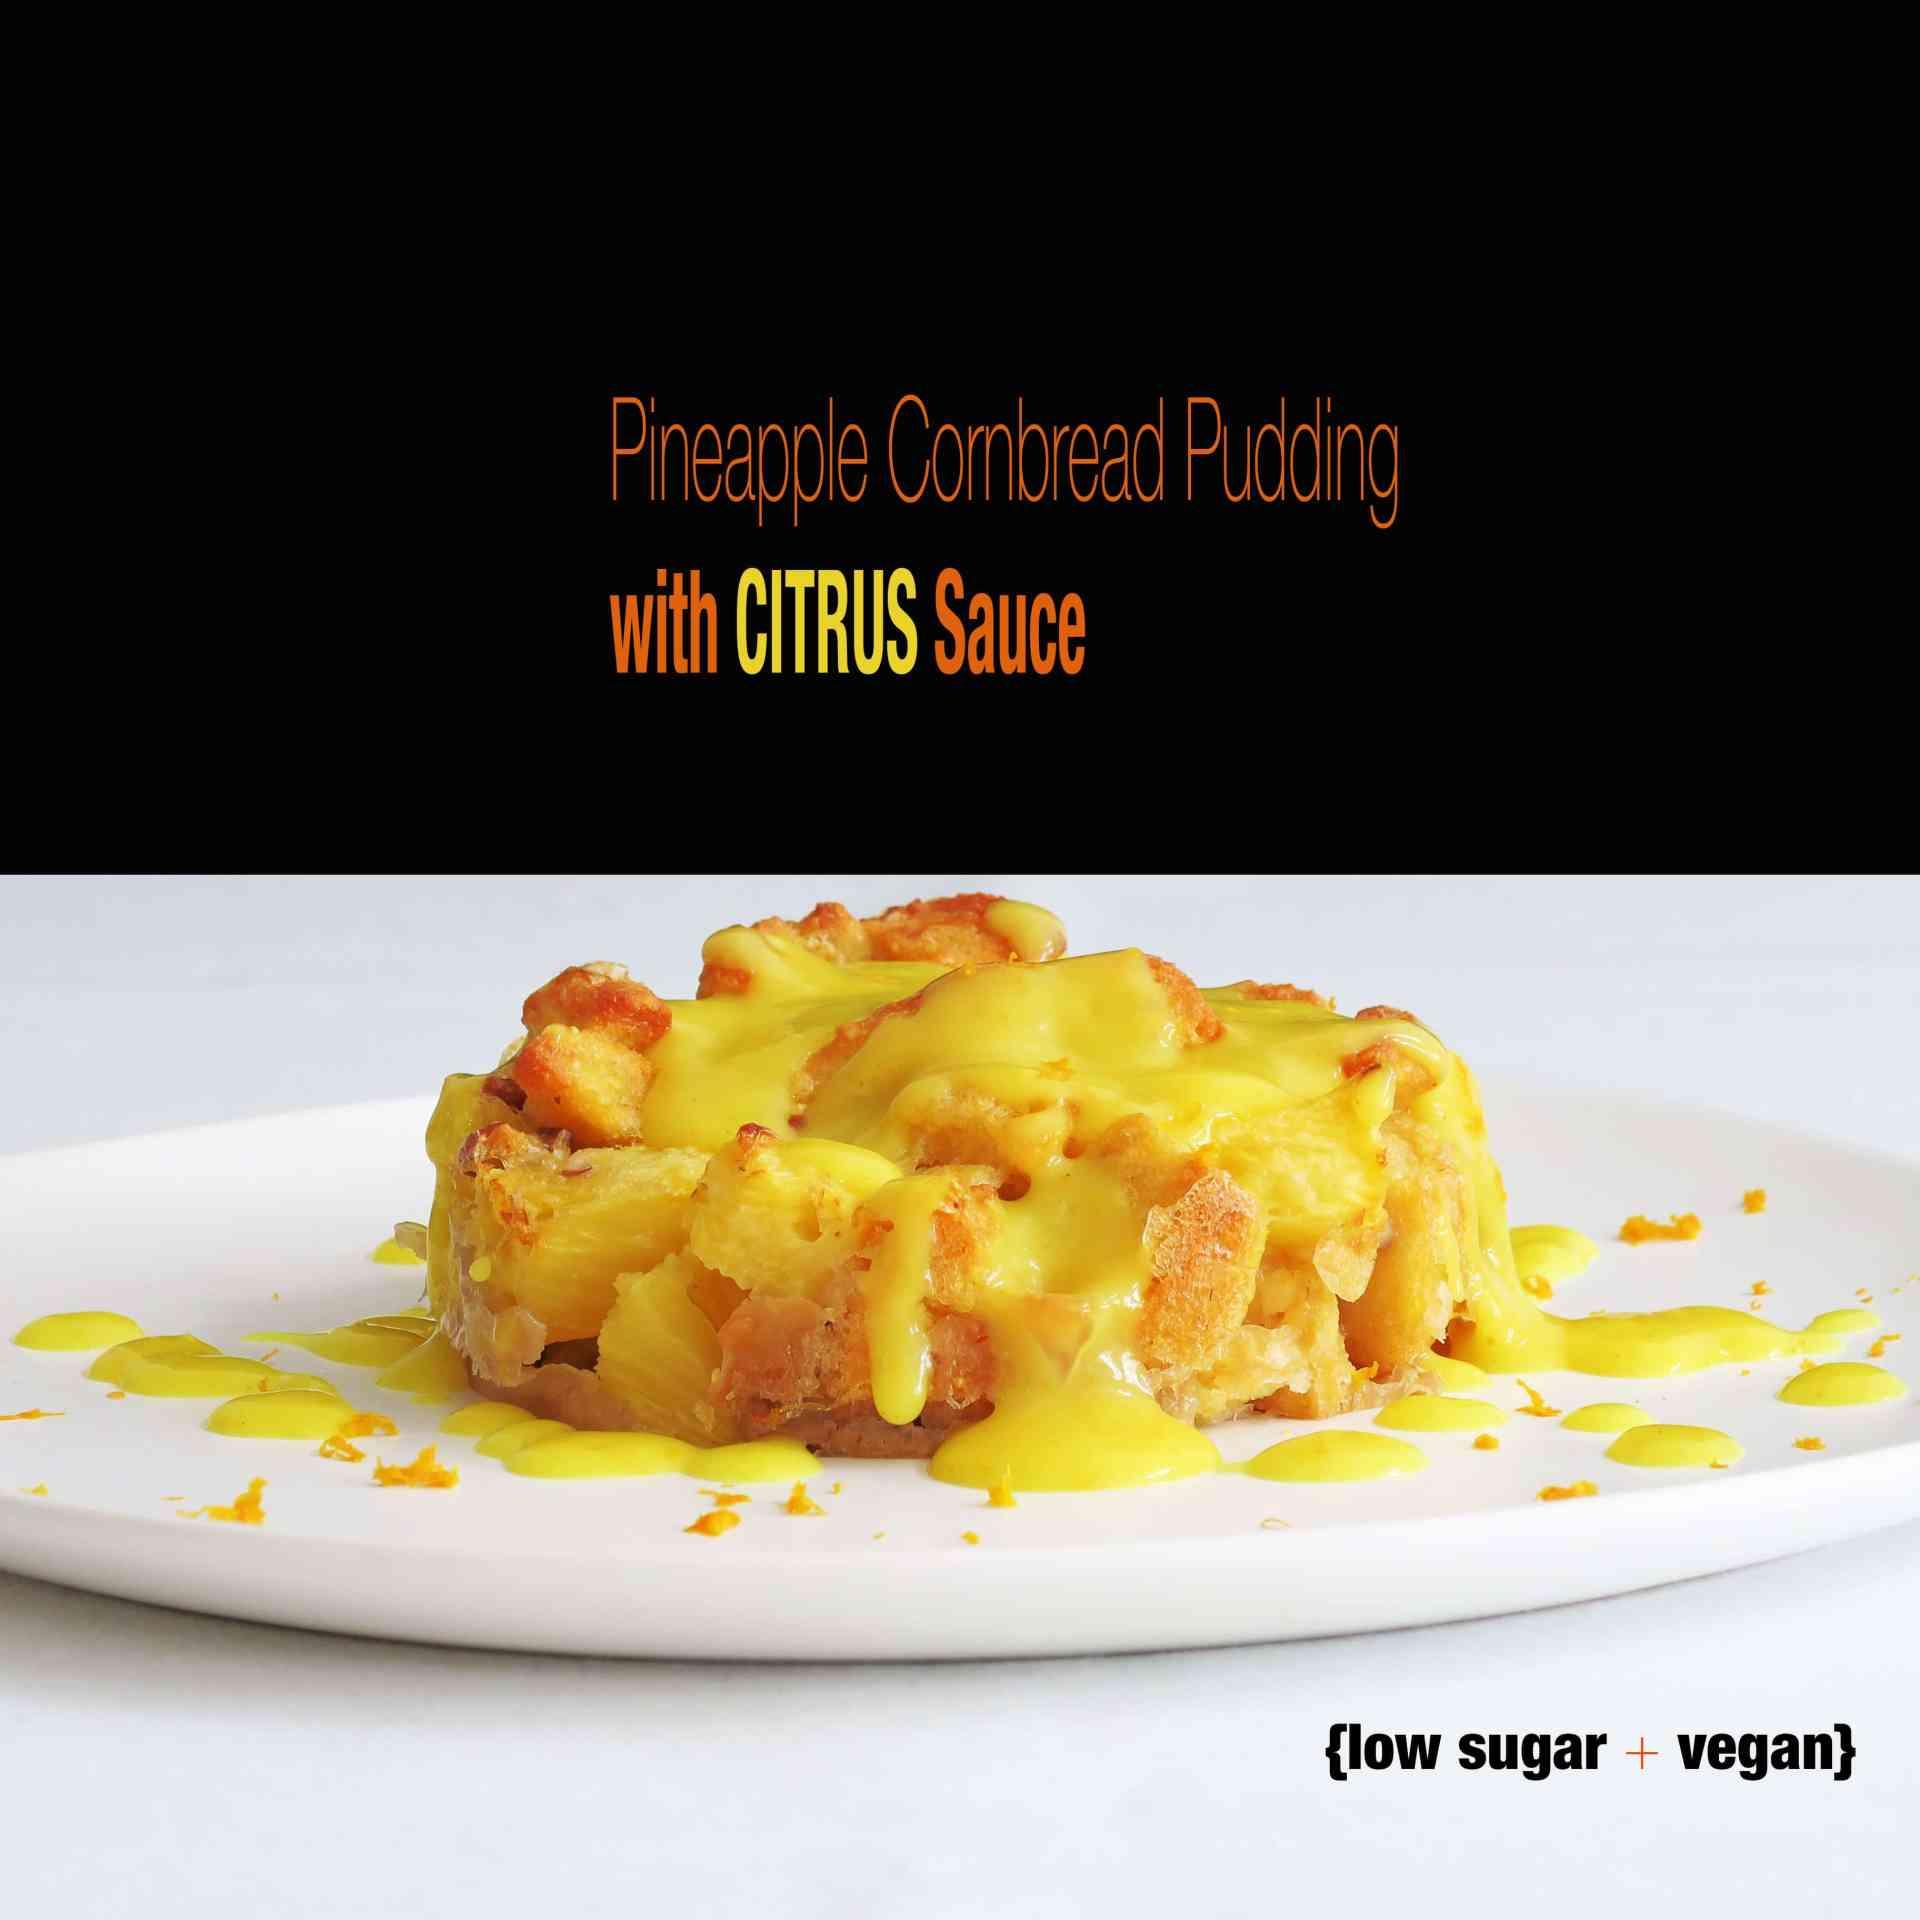 Pineapple Cornbread Pudding with Citrus Sauce {Vegan}